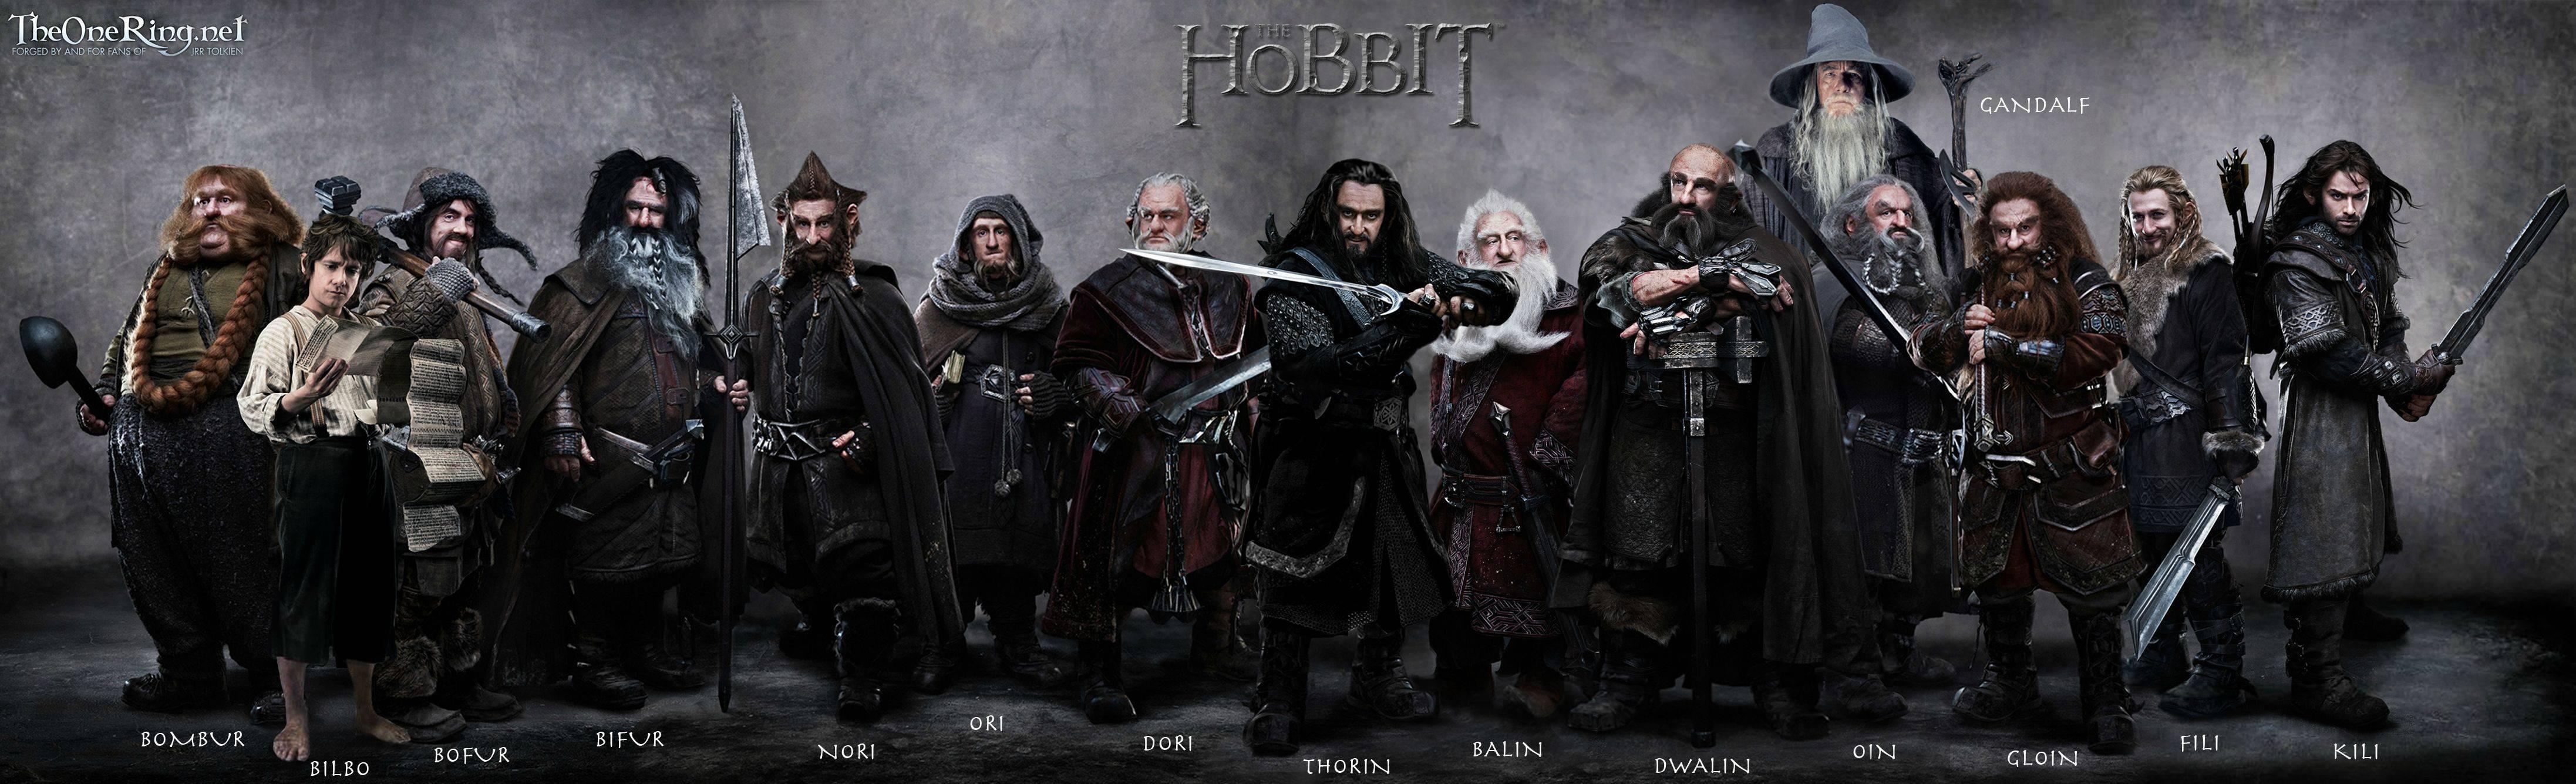 the hobbit wallpaper   The Hobbit The Desolation of Smaug Wallpaper 4387x1335